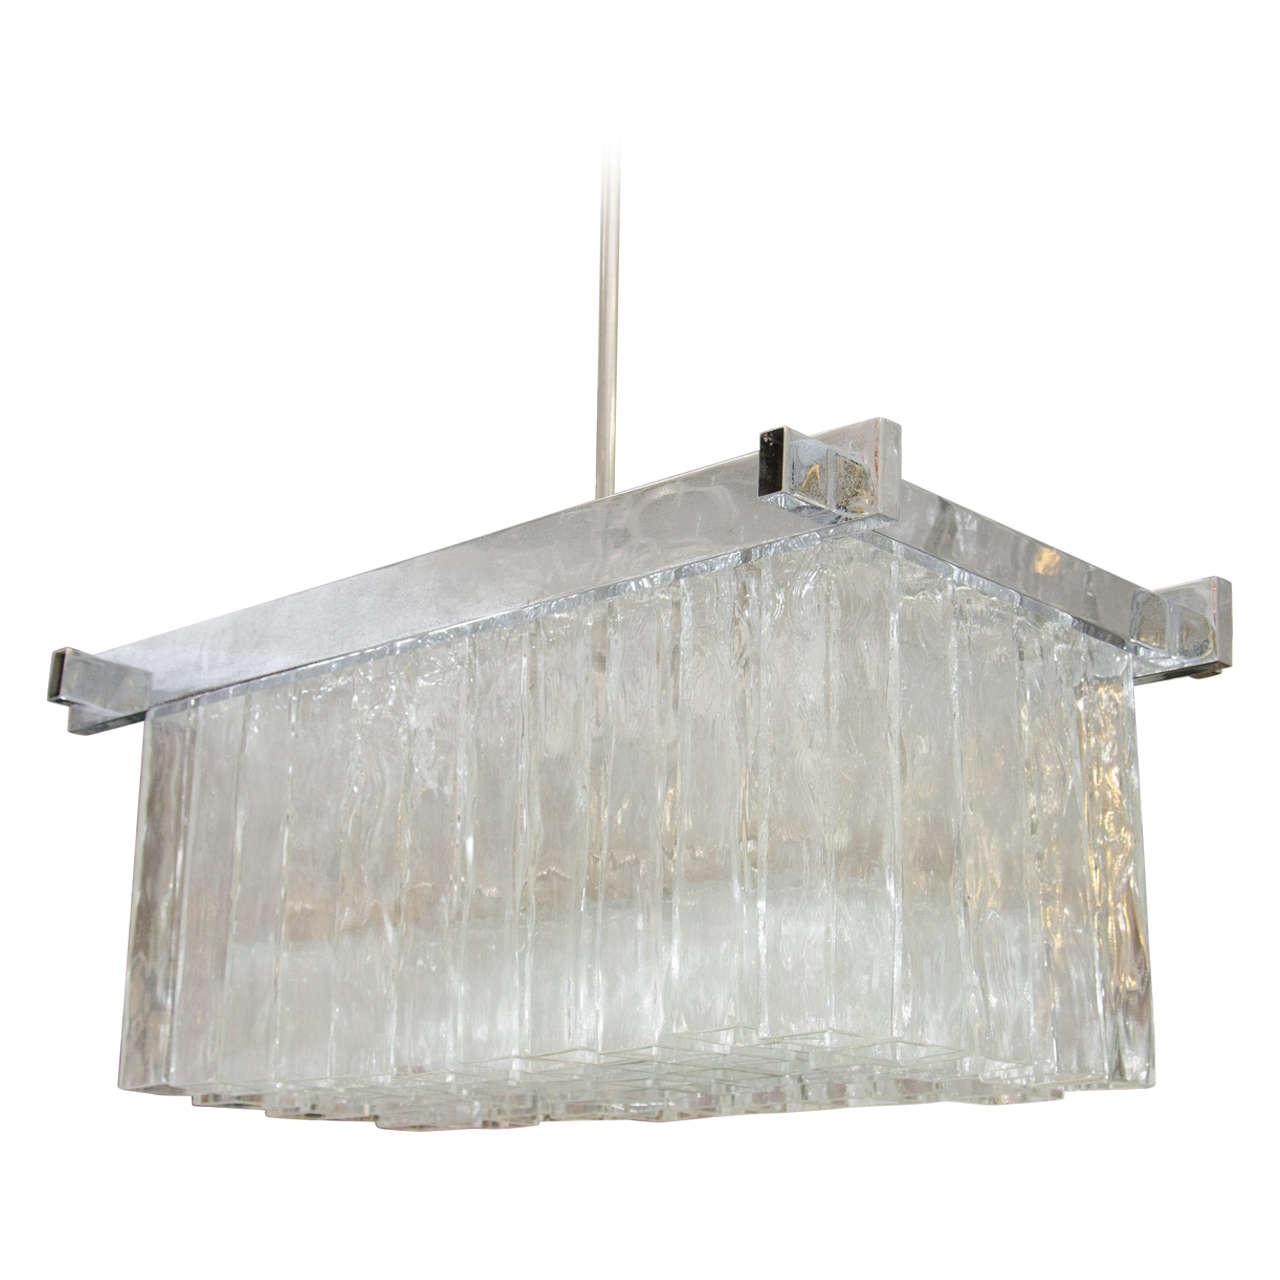 Monumental camer murano glass chandelier with square tubular monumental camer murano glass chandelier with square tubular pendants for sale at 1stdibs arubaitofo Choice Image